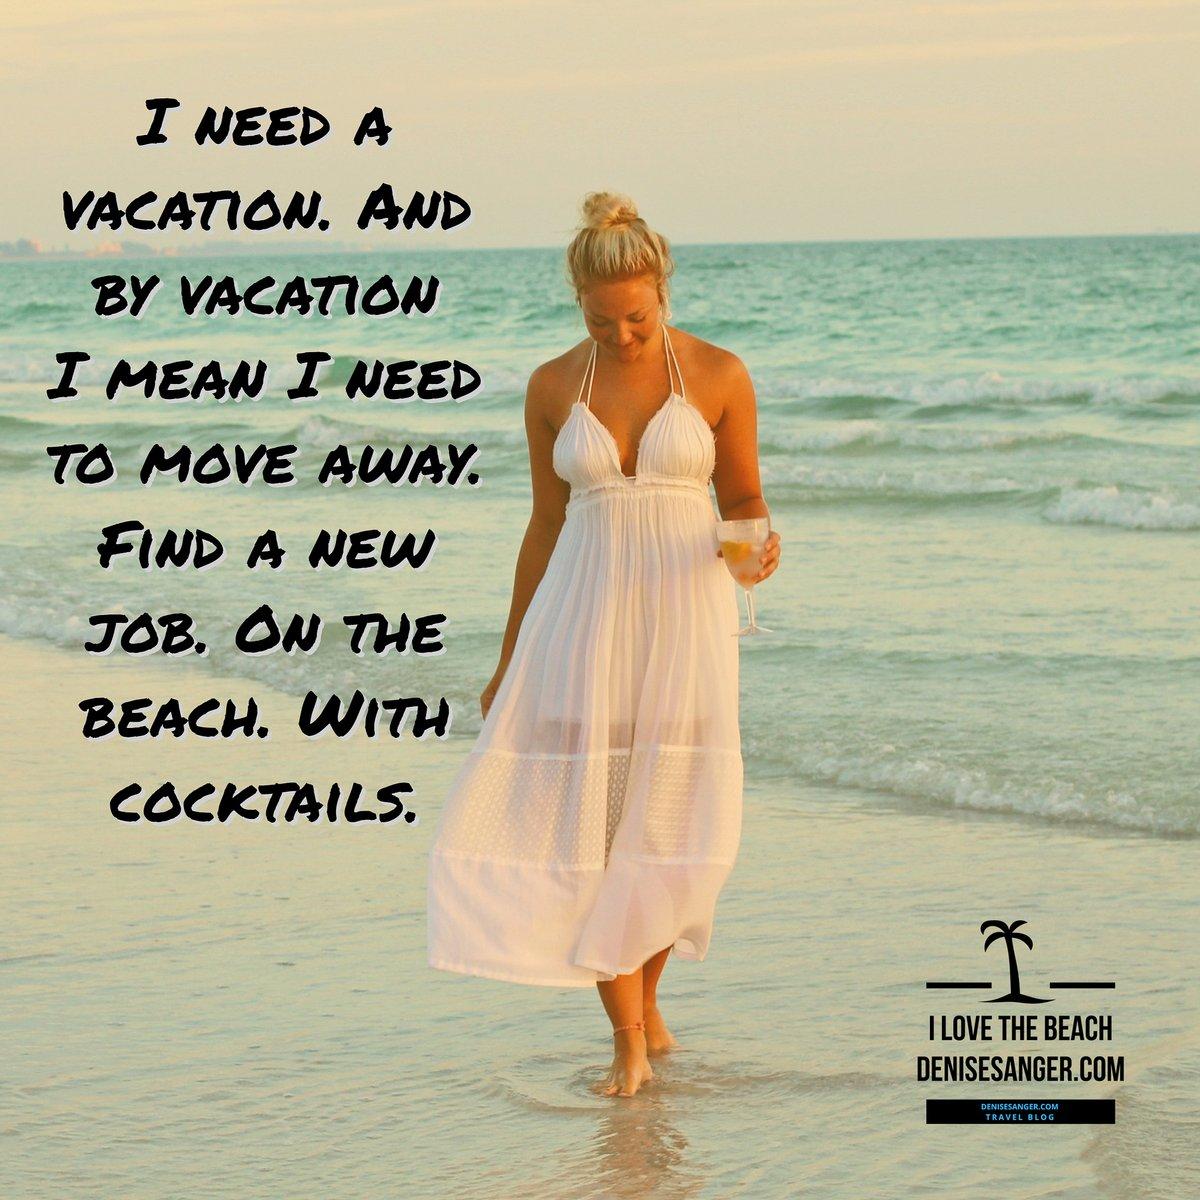 #beach #travel #beachlovers #travelblogger https://t.co/iw6TB25TS0